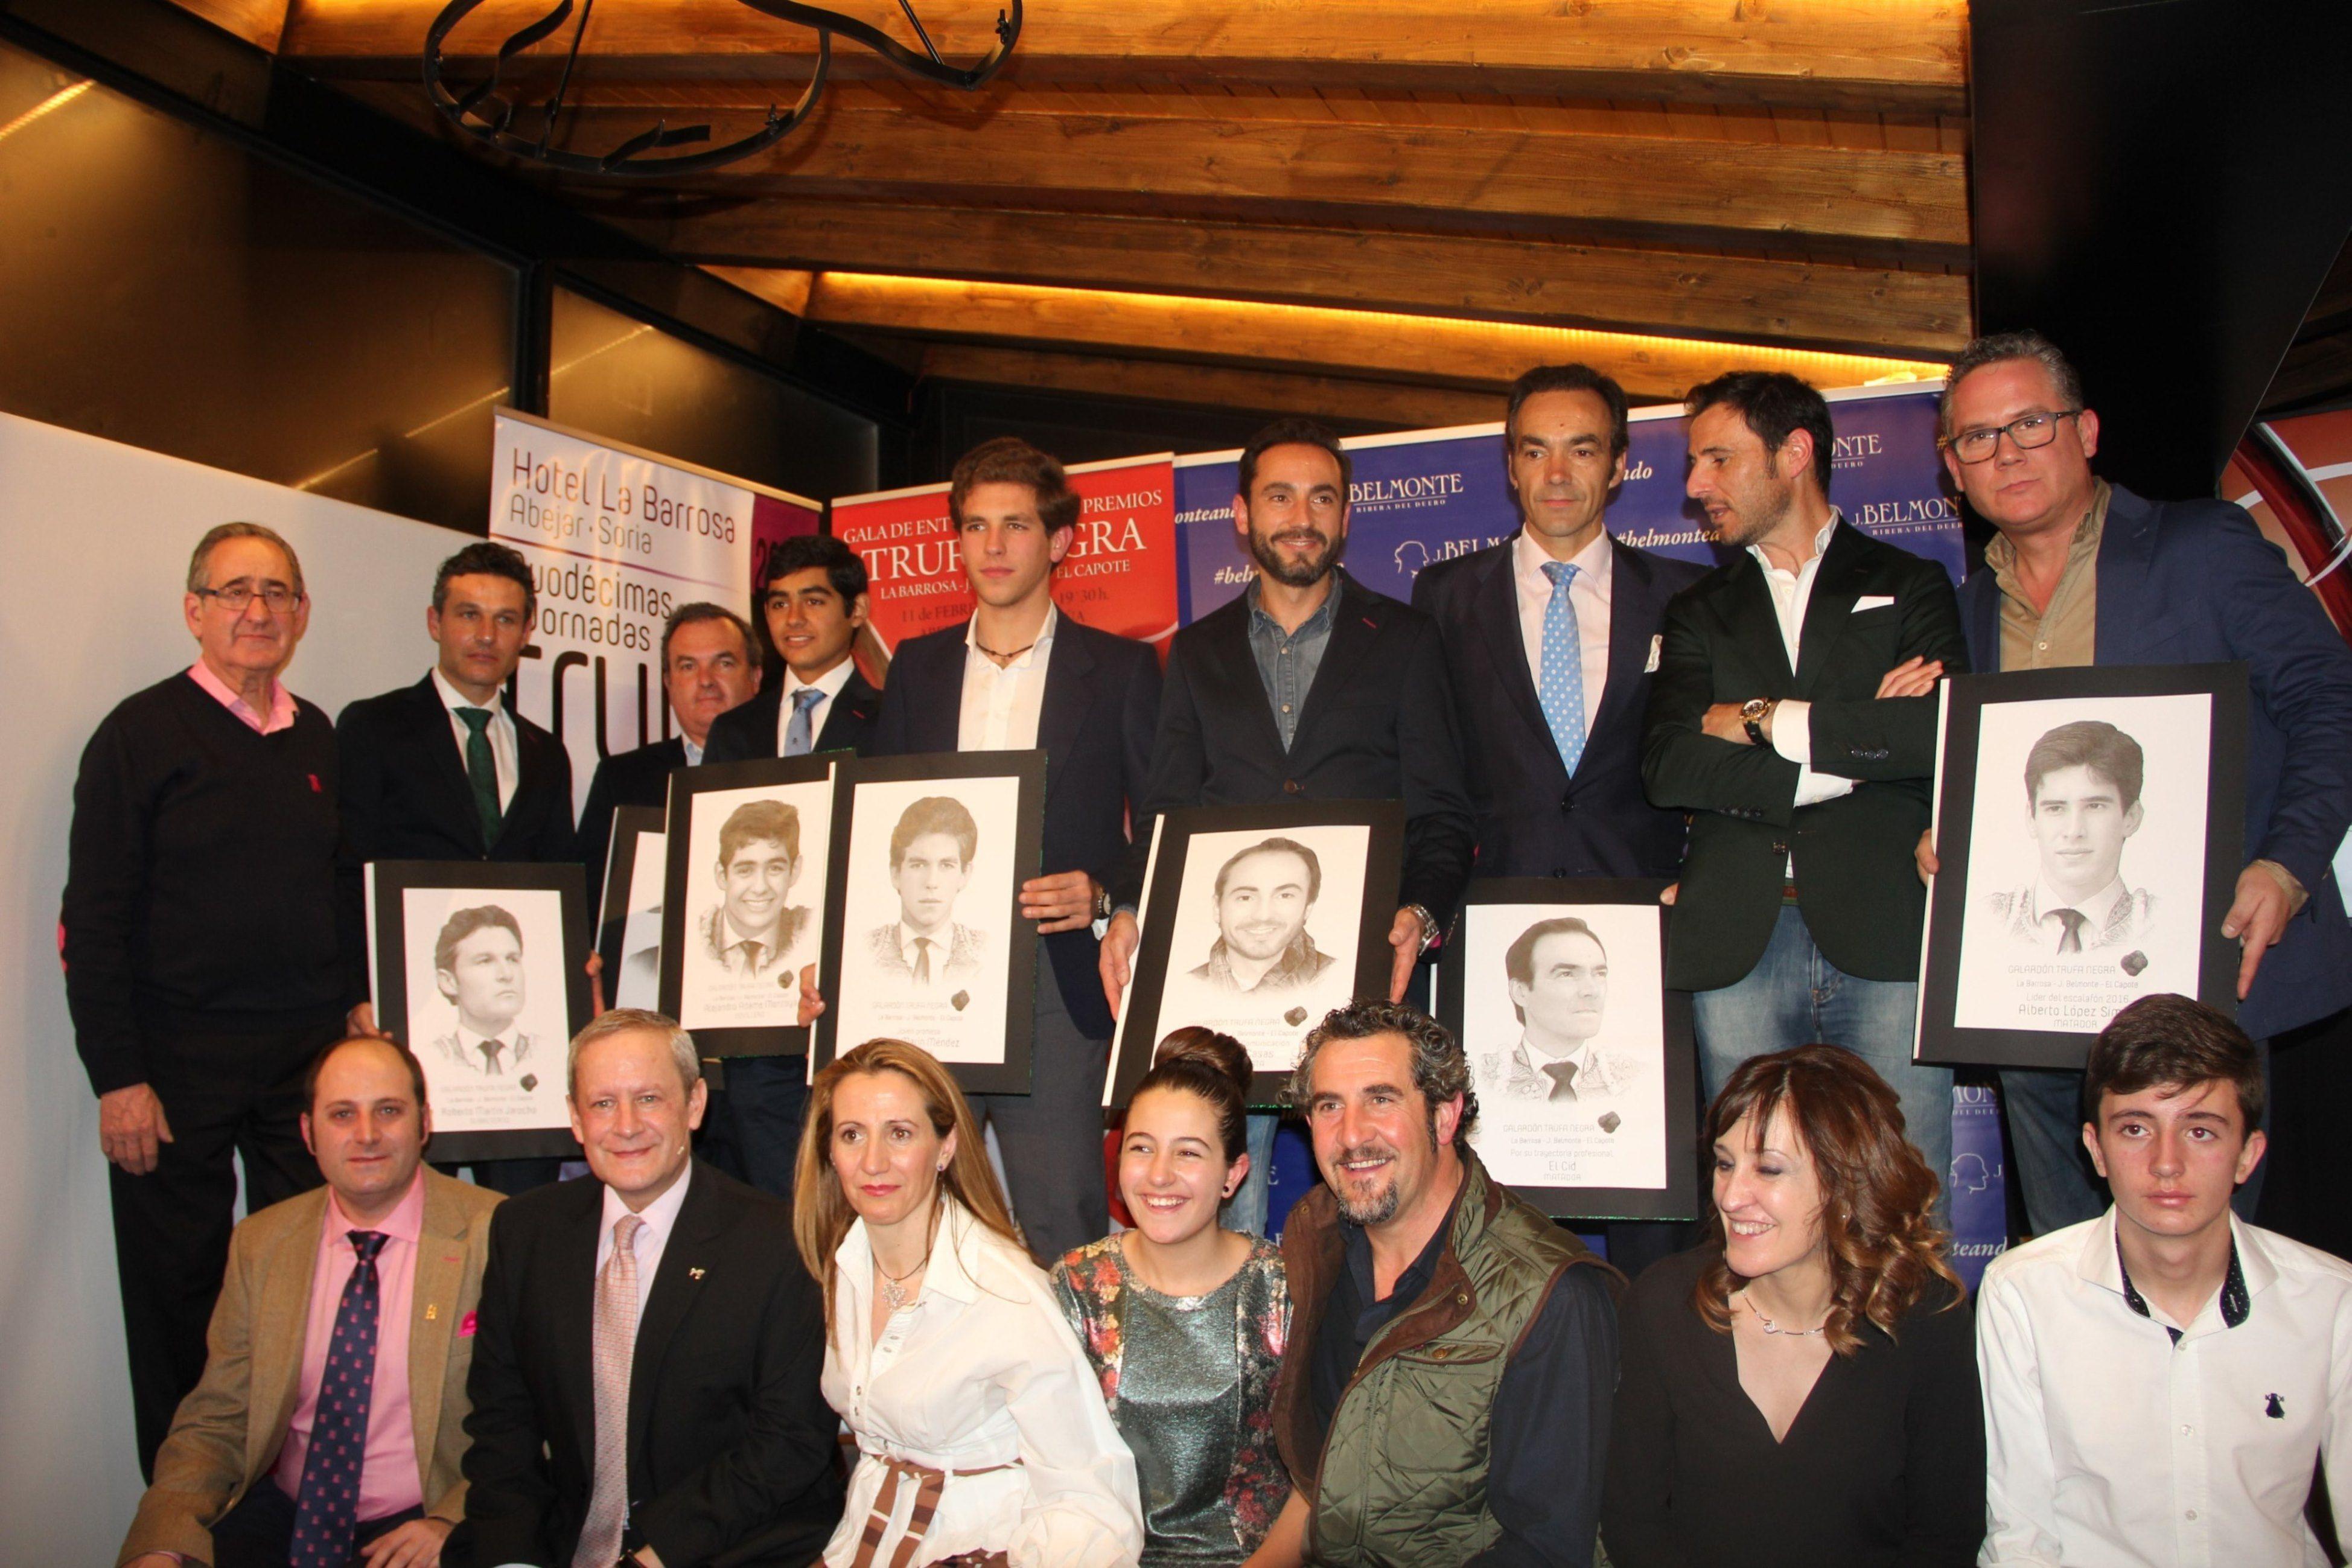 Foto de III Entrega de Premios Taurinos Trufa Negra La Barrosa